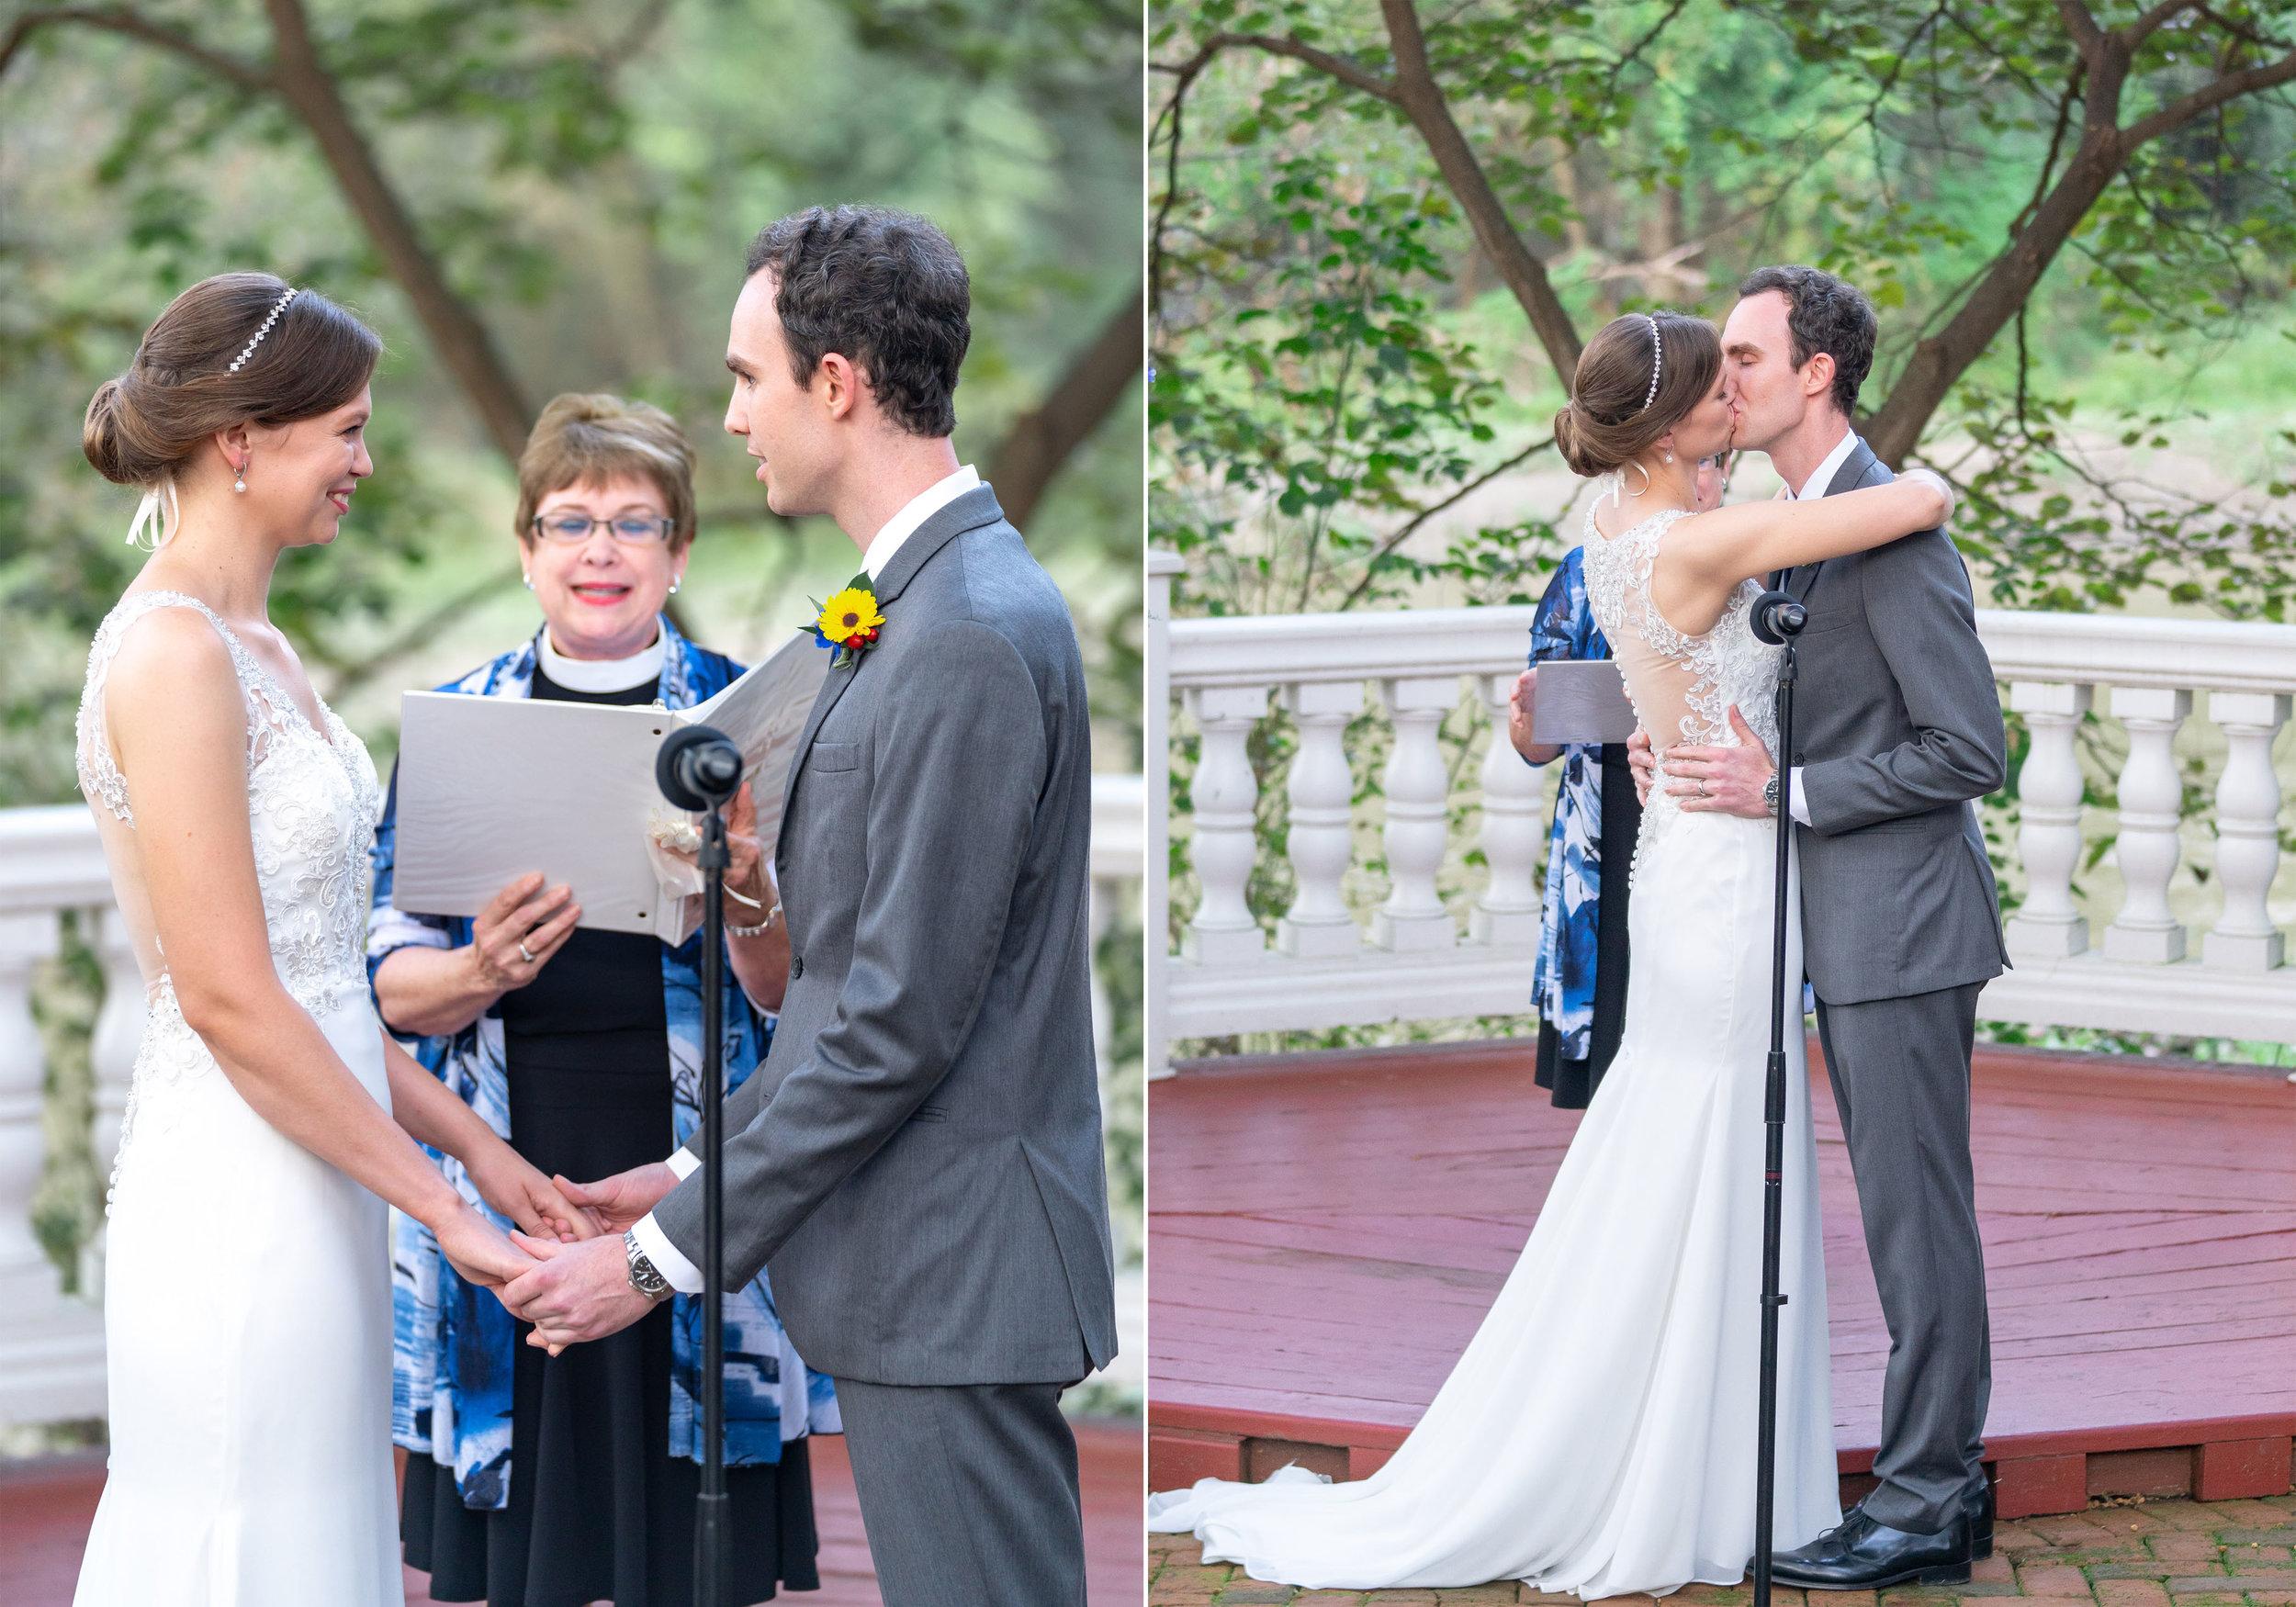 Bride in Morilee Myka and groom kiss after wedding ceremony at Elkridge Furnace Inn